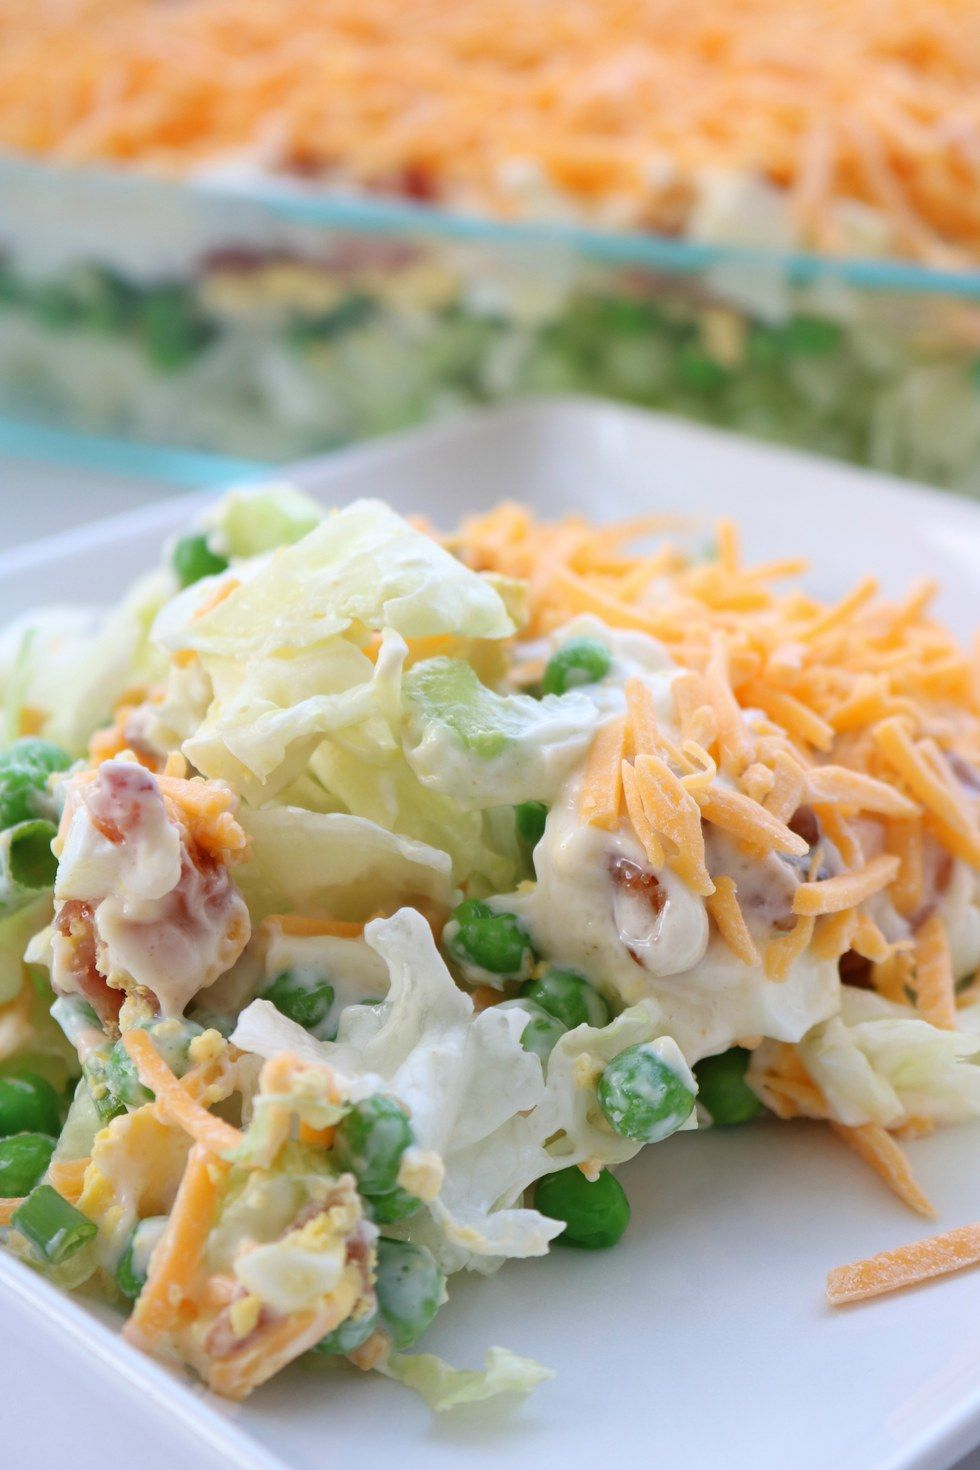 Delicious 7 Layer Salad Recipe Seven Layer Salad Layered Salad Recipes Layered Salad